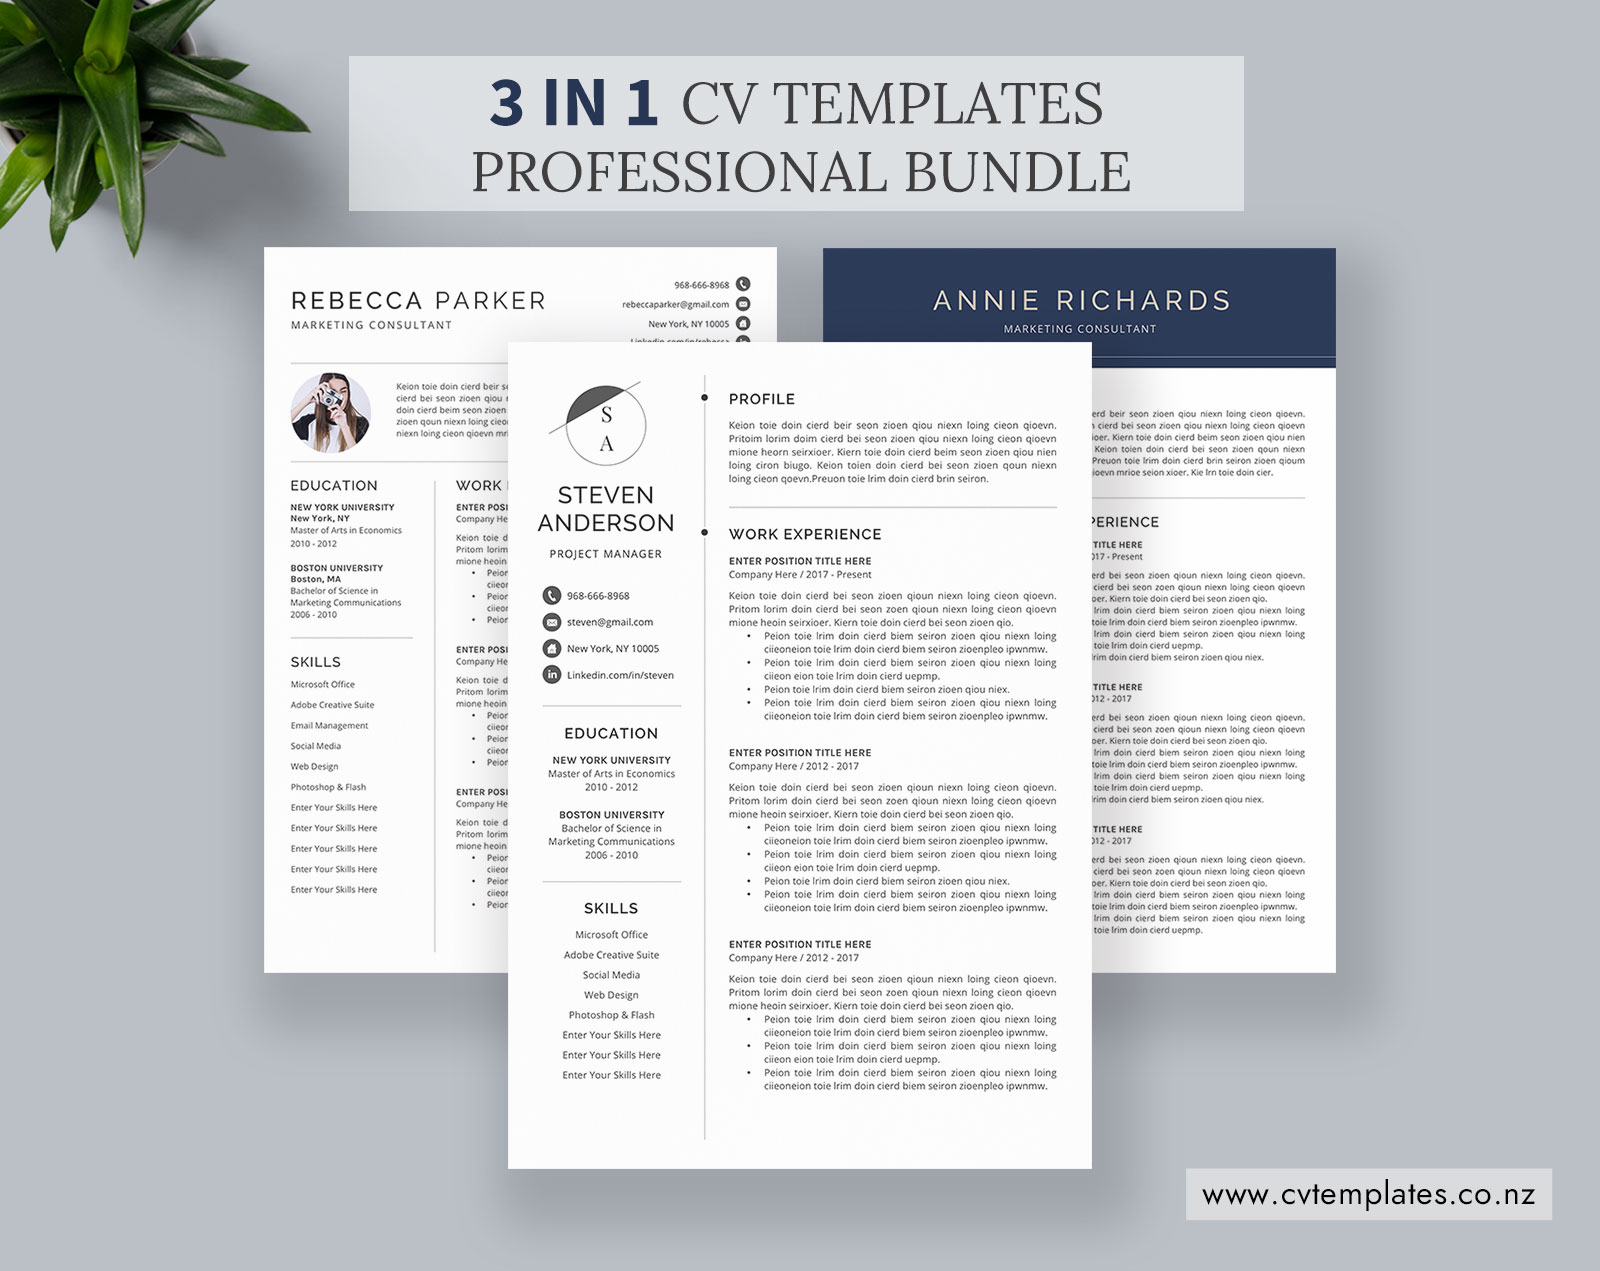 CV Bundle, CV Templates, Professional Curriculum Vitae, MS Word CV  Template, Minimalist CV Format, Cover Letter, Modern Resume, Best Resume,  Instant ...